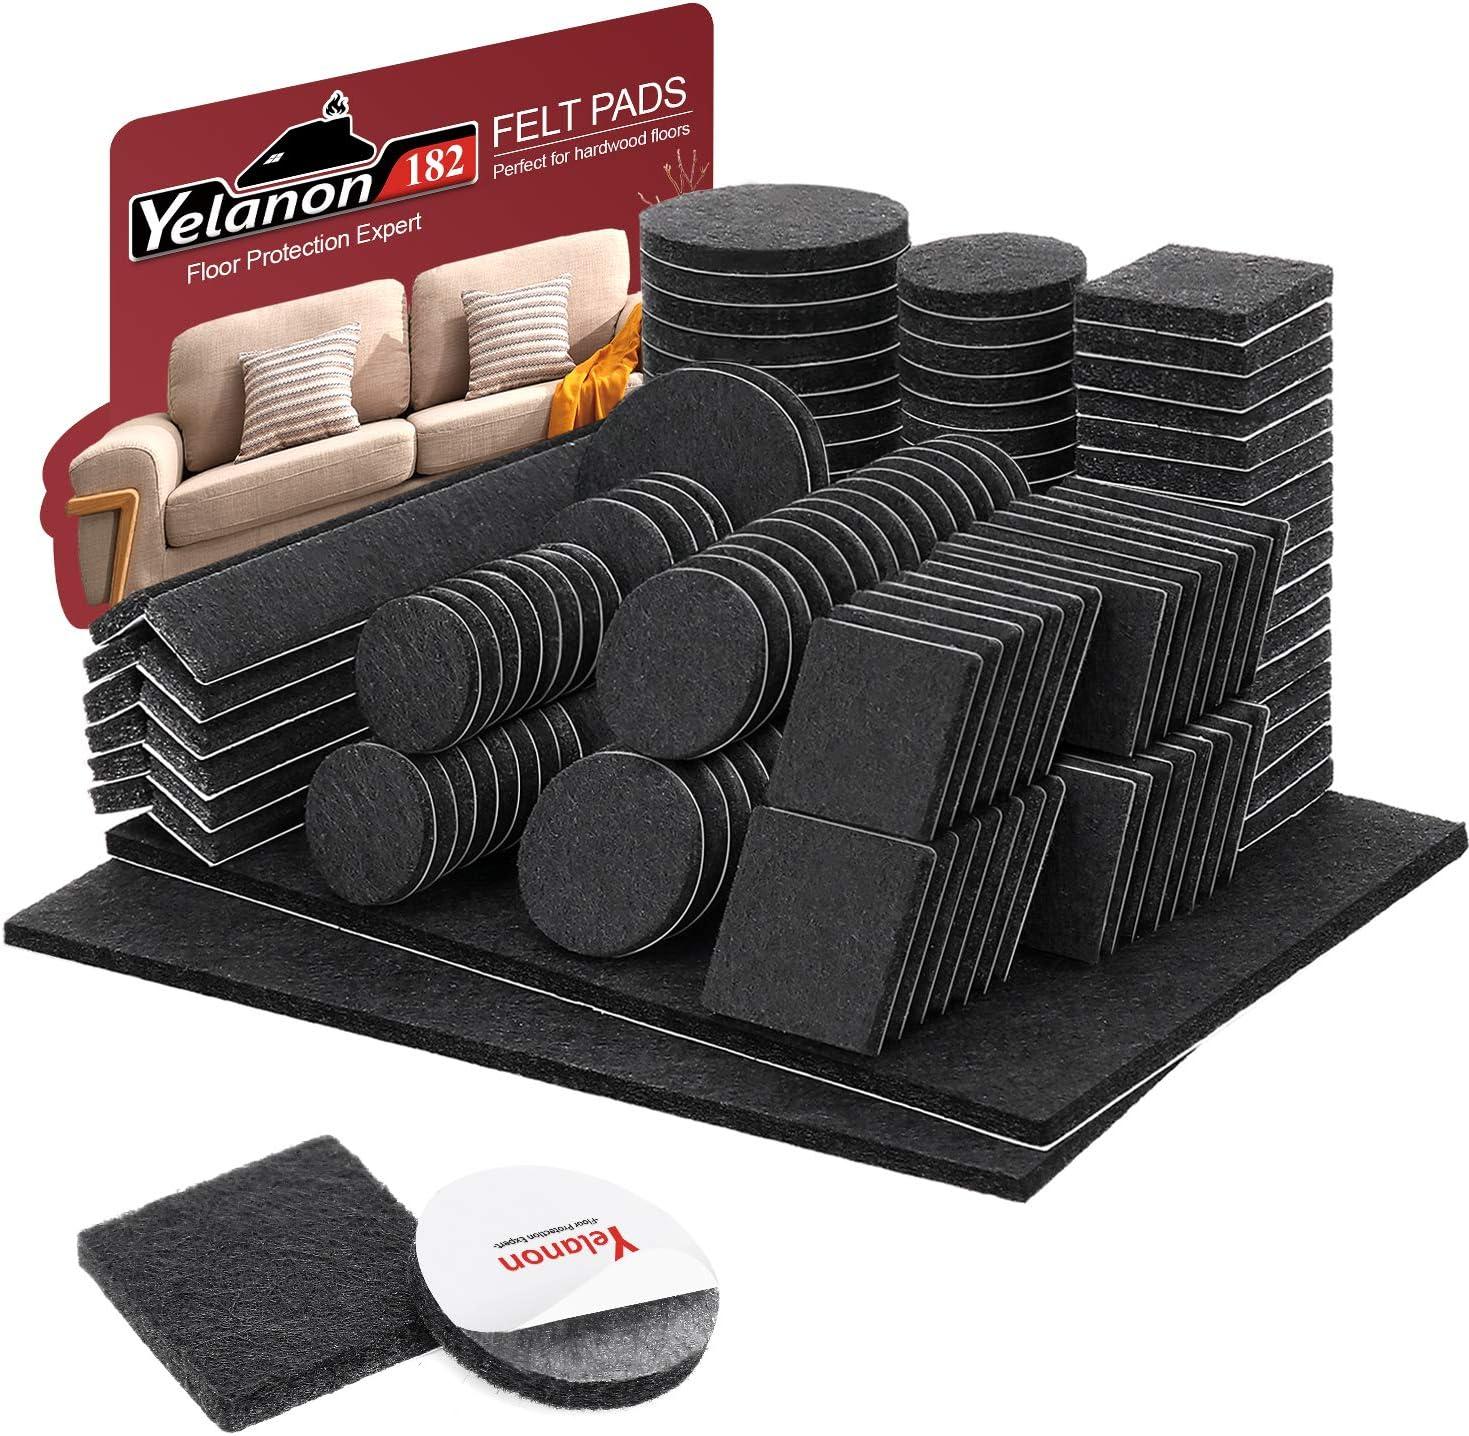 Felt Furniture Pads -182 Pcs Furniture Pads Self Adhesive, Cuttable Felt Chair Pads, Anti Scratch Floor Protectors for Furniture Feet Chair Legs, Furniture Felt Pads for Hardwoods Floors, Black